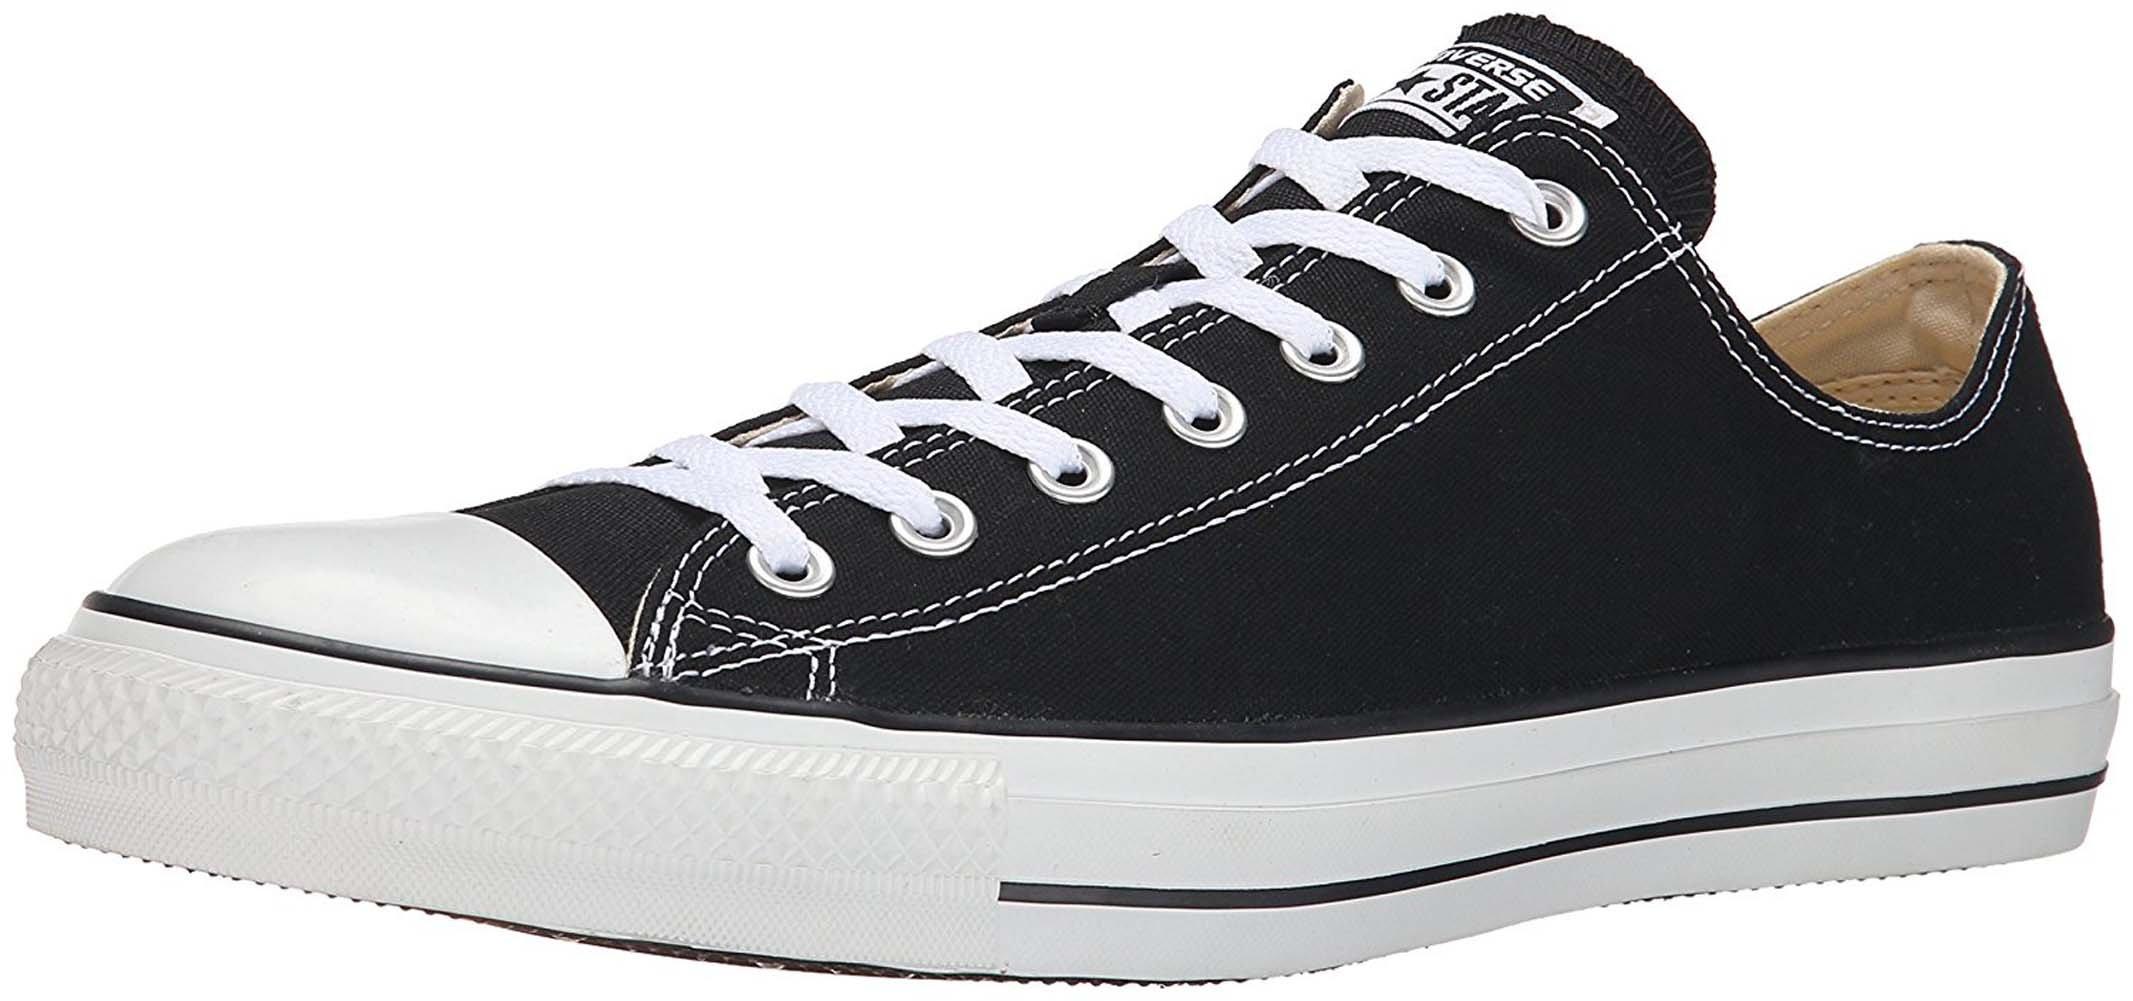 Converse Unisex Chuck Taylor All Star Ox Low Top Sneakers (39 M EU/8 B(M) US Women/6 D(M) US Men, Black-White)